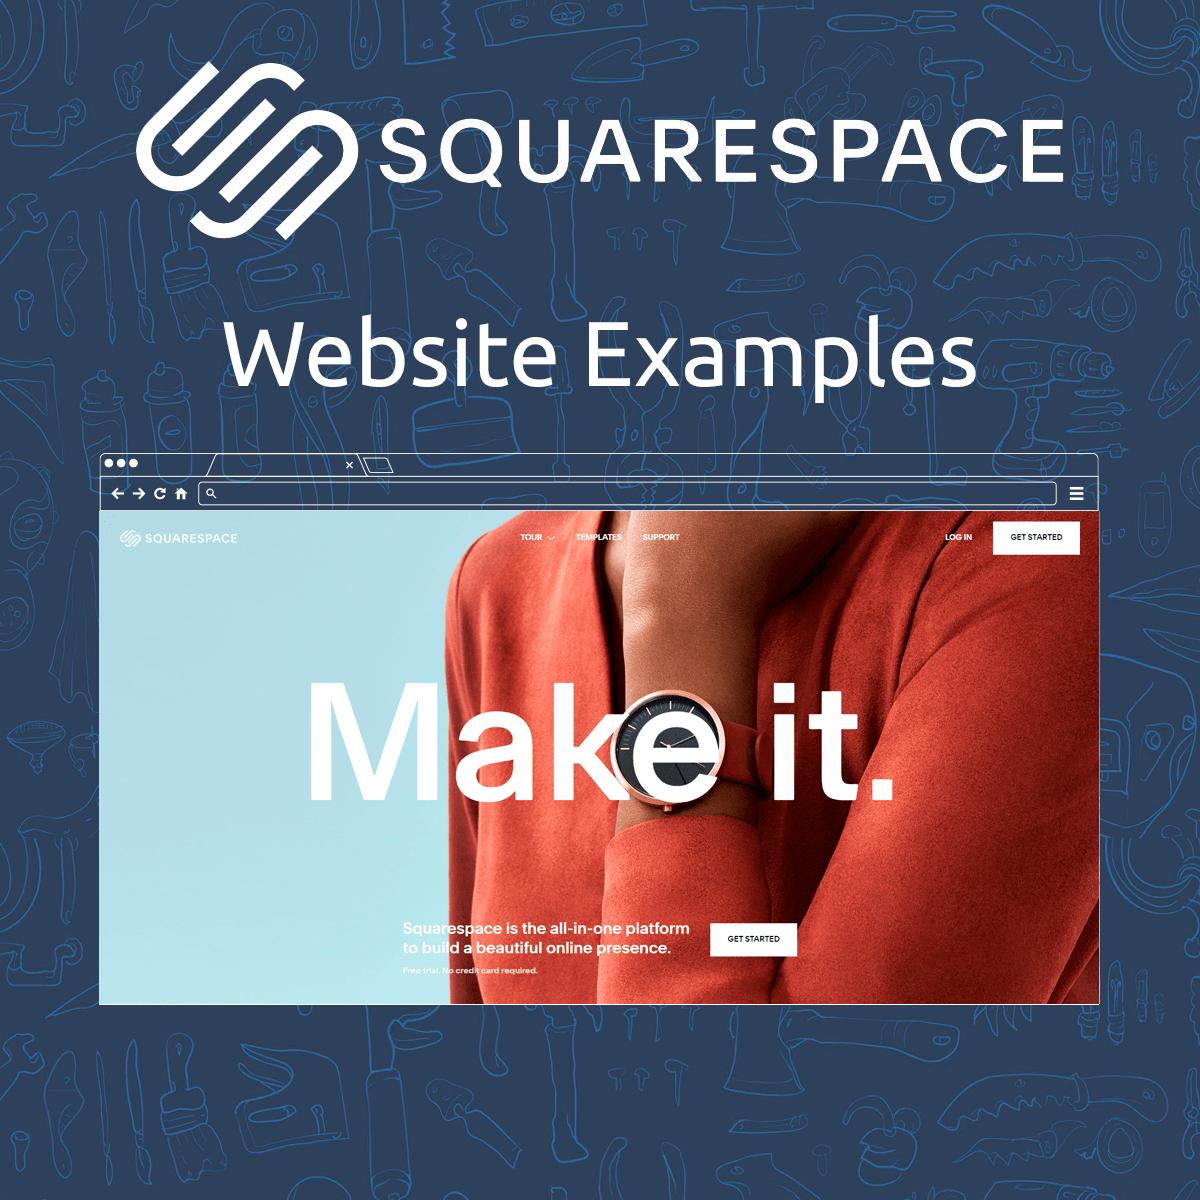 Squarespace Website Examples